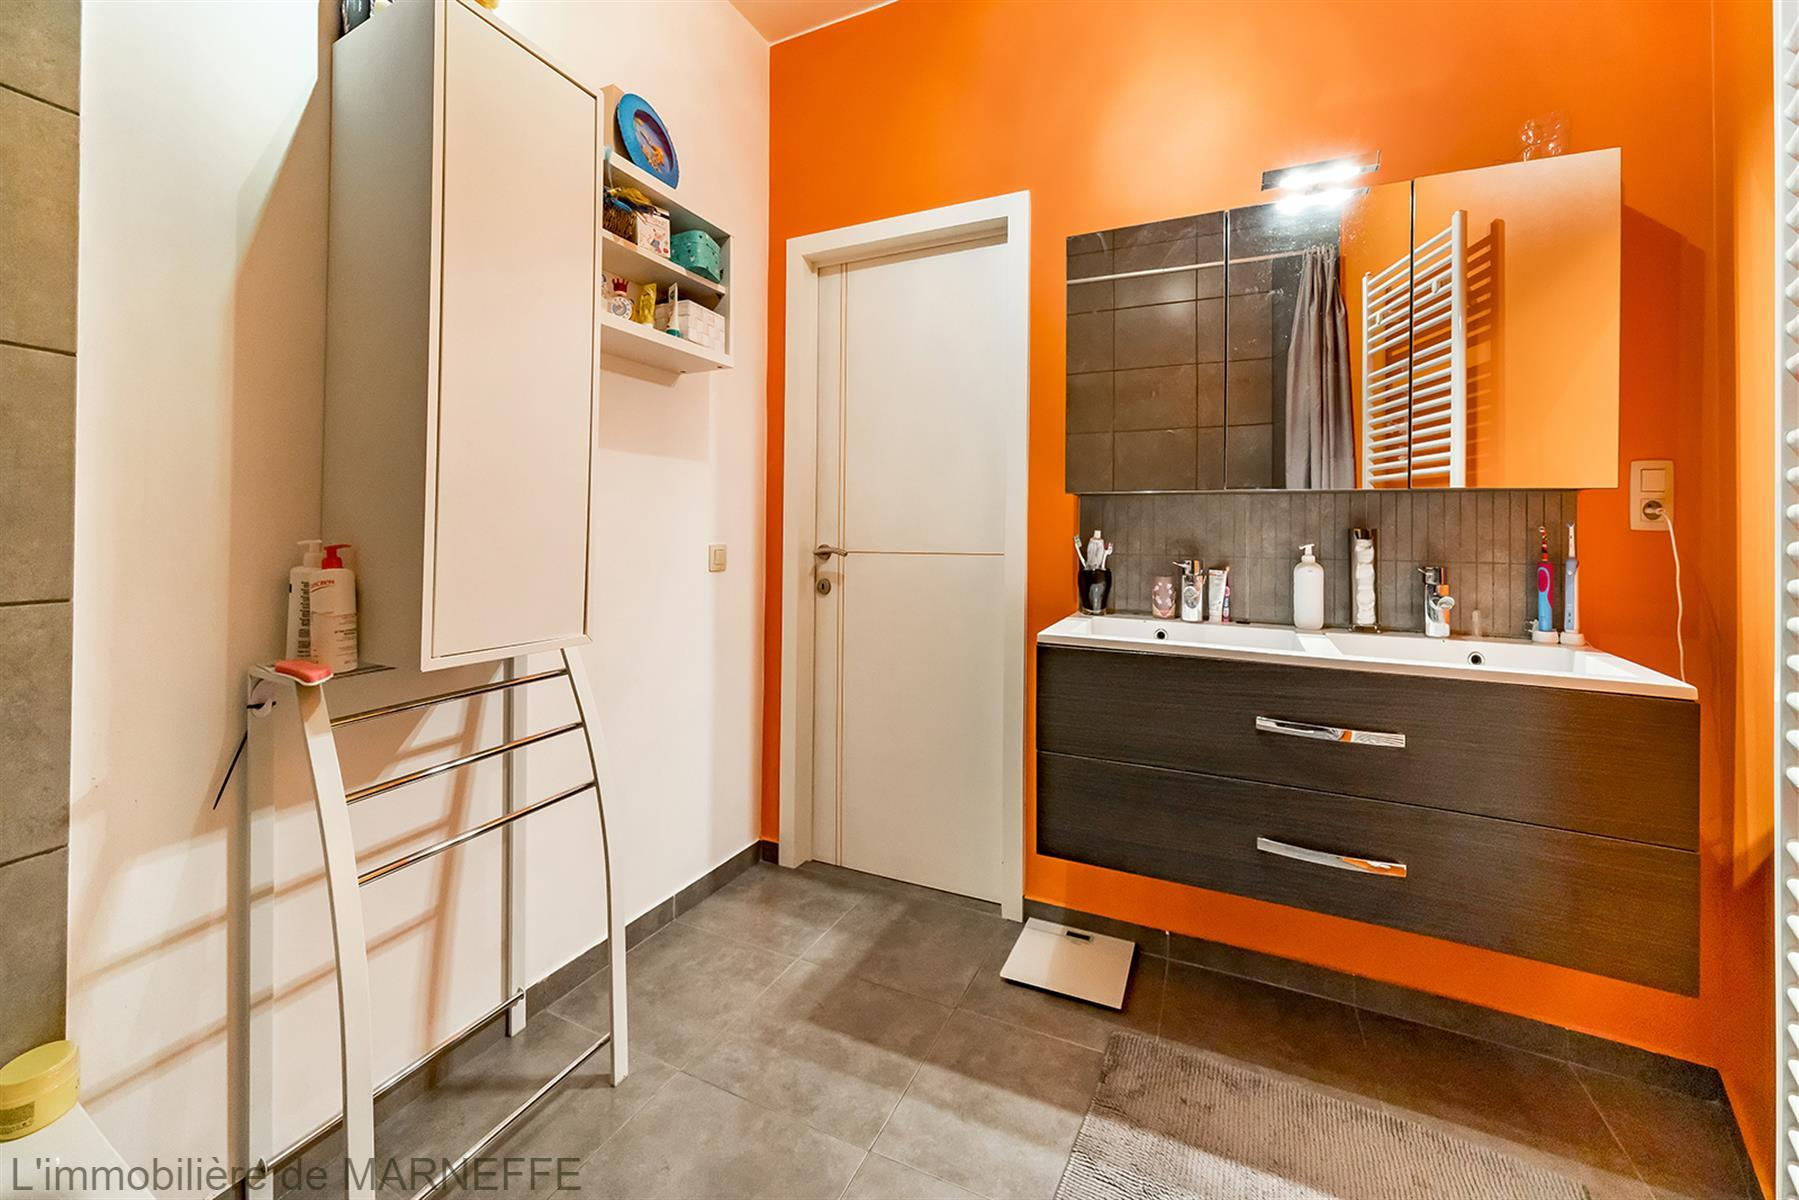 Appartement avec jardin - Orp-Jauche - #3625402-15